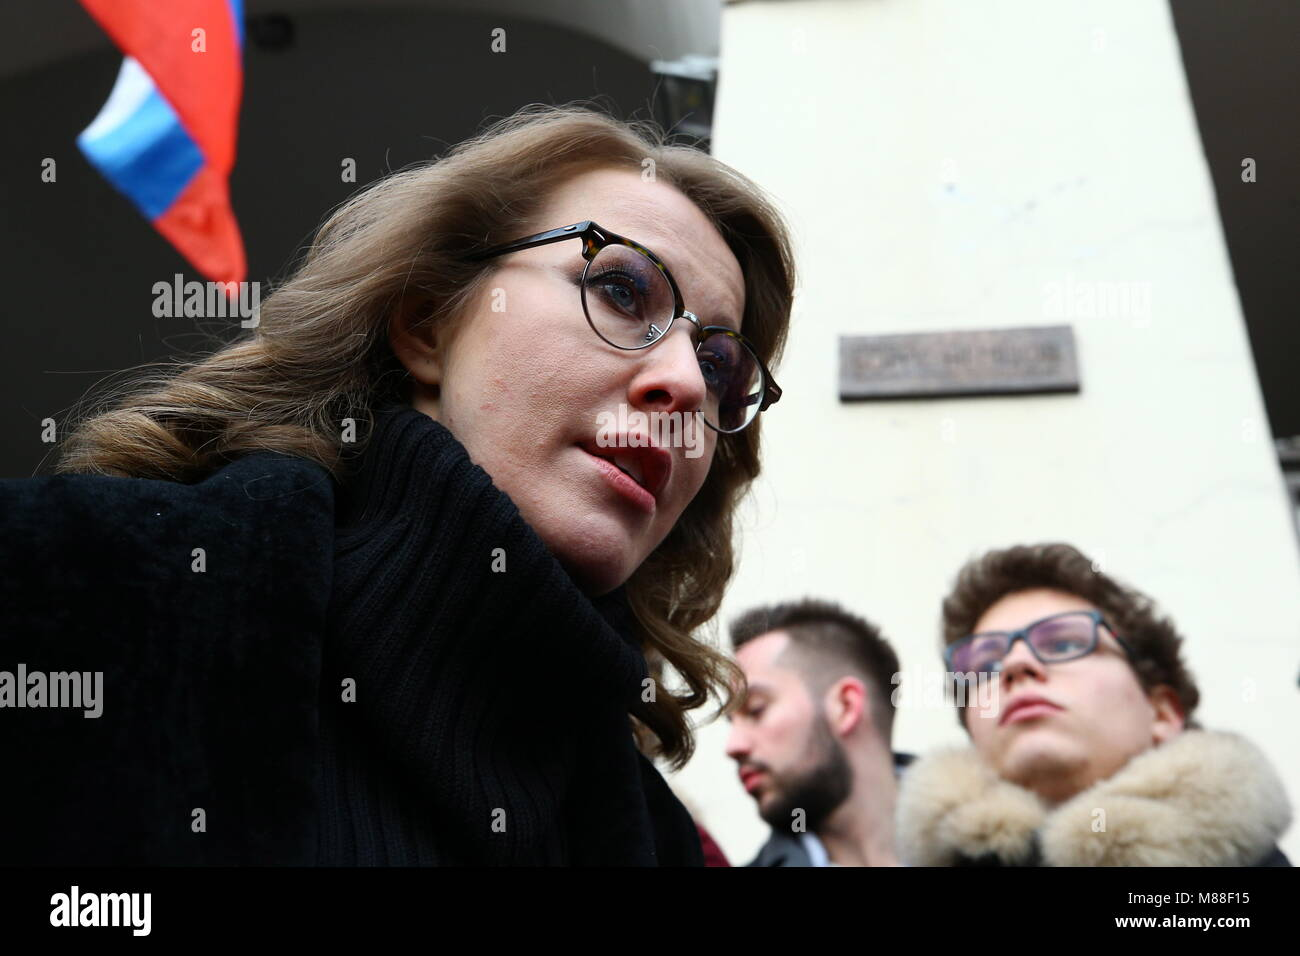 Ksenia Sobchak and Sergey Kapkov split up 05/18/2011 92